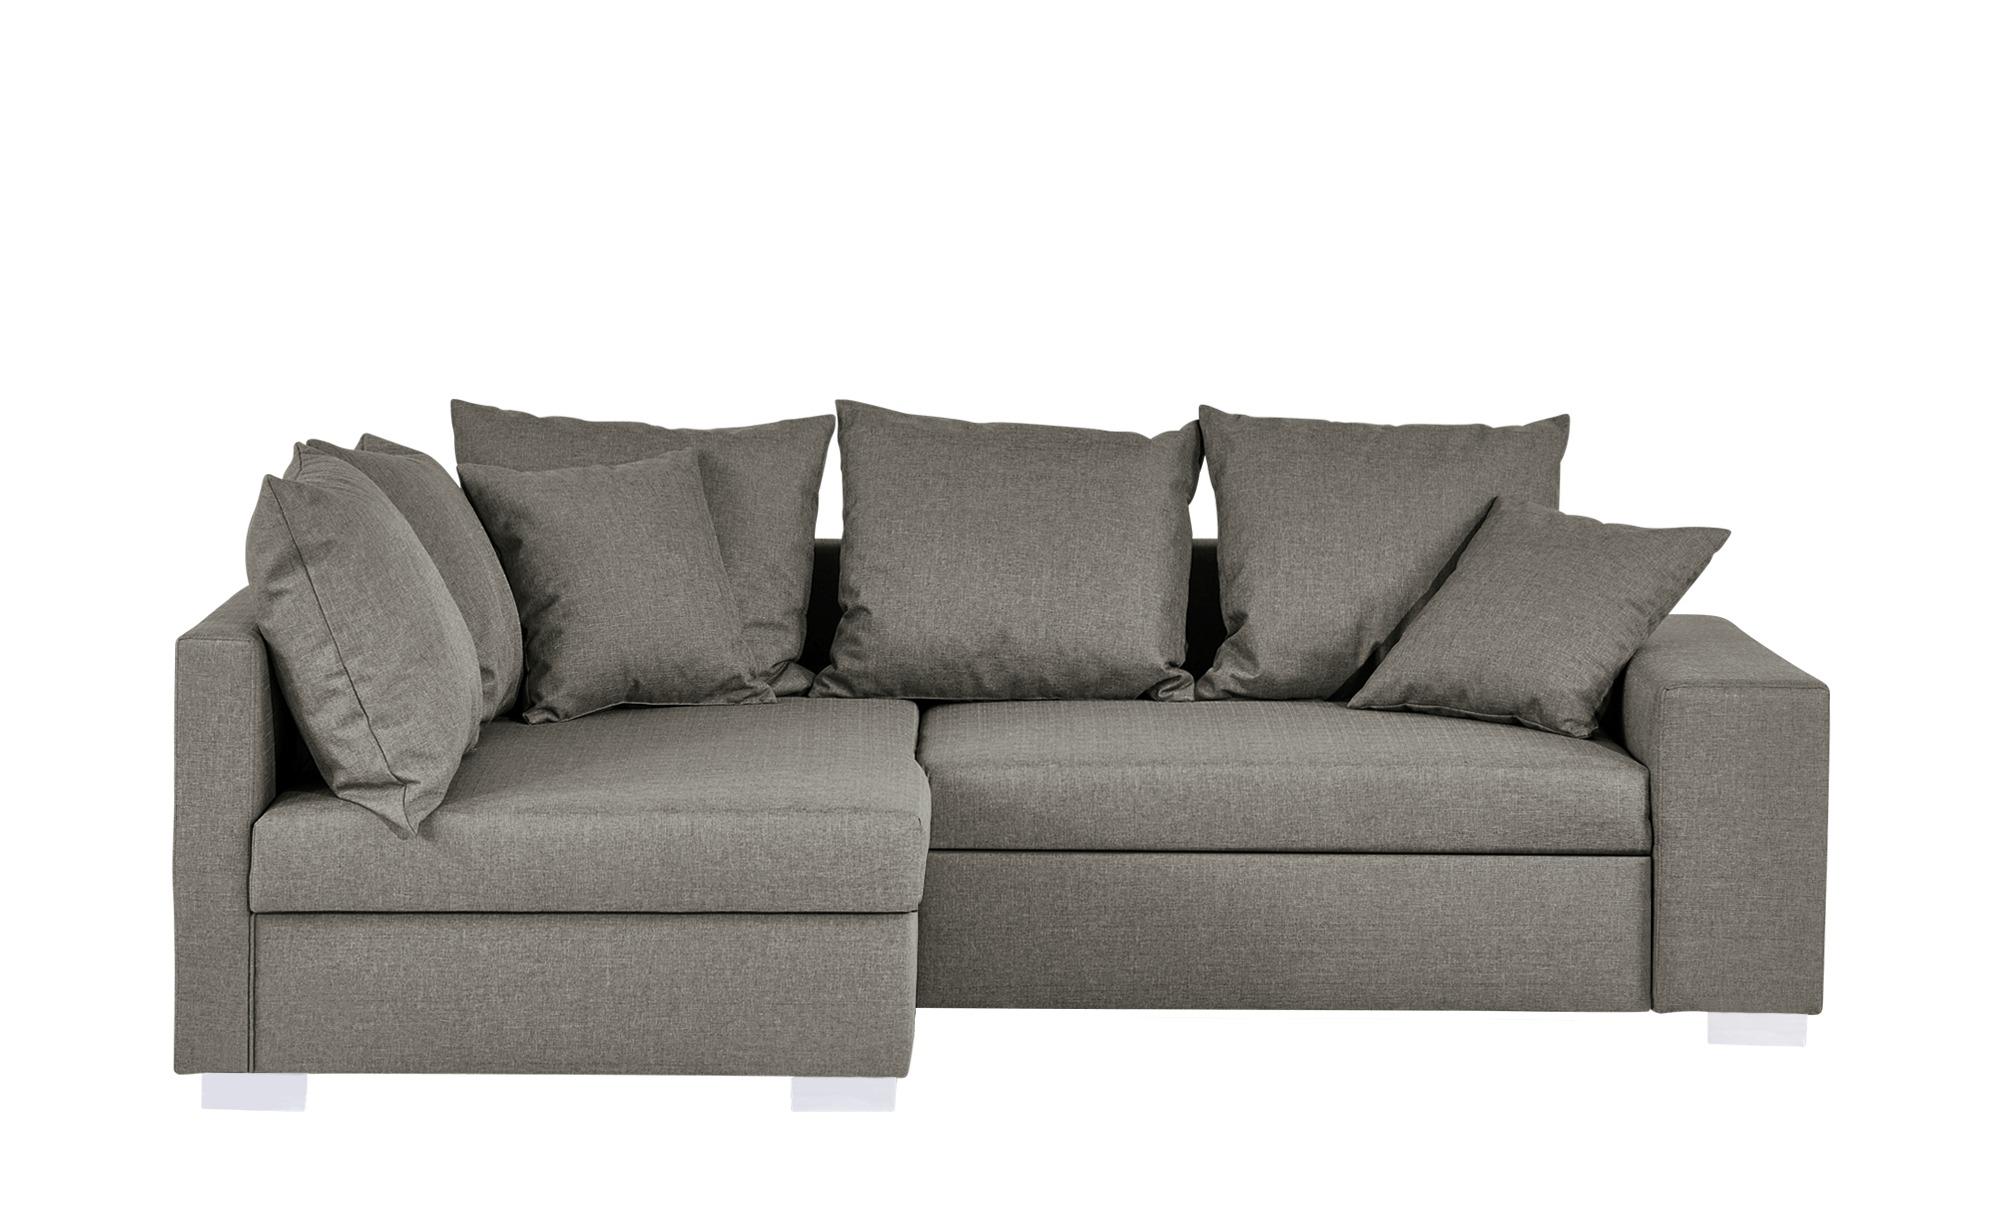 smart ecksofa lena breite h he grau online kaufen bei woonio. Black Bedroom Furniture Sets. Home Design Ideas